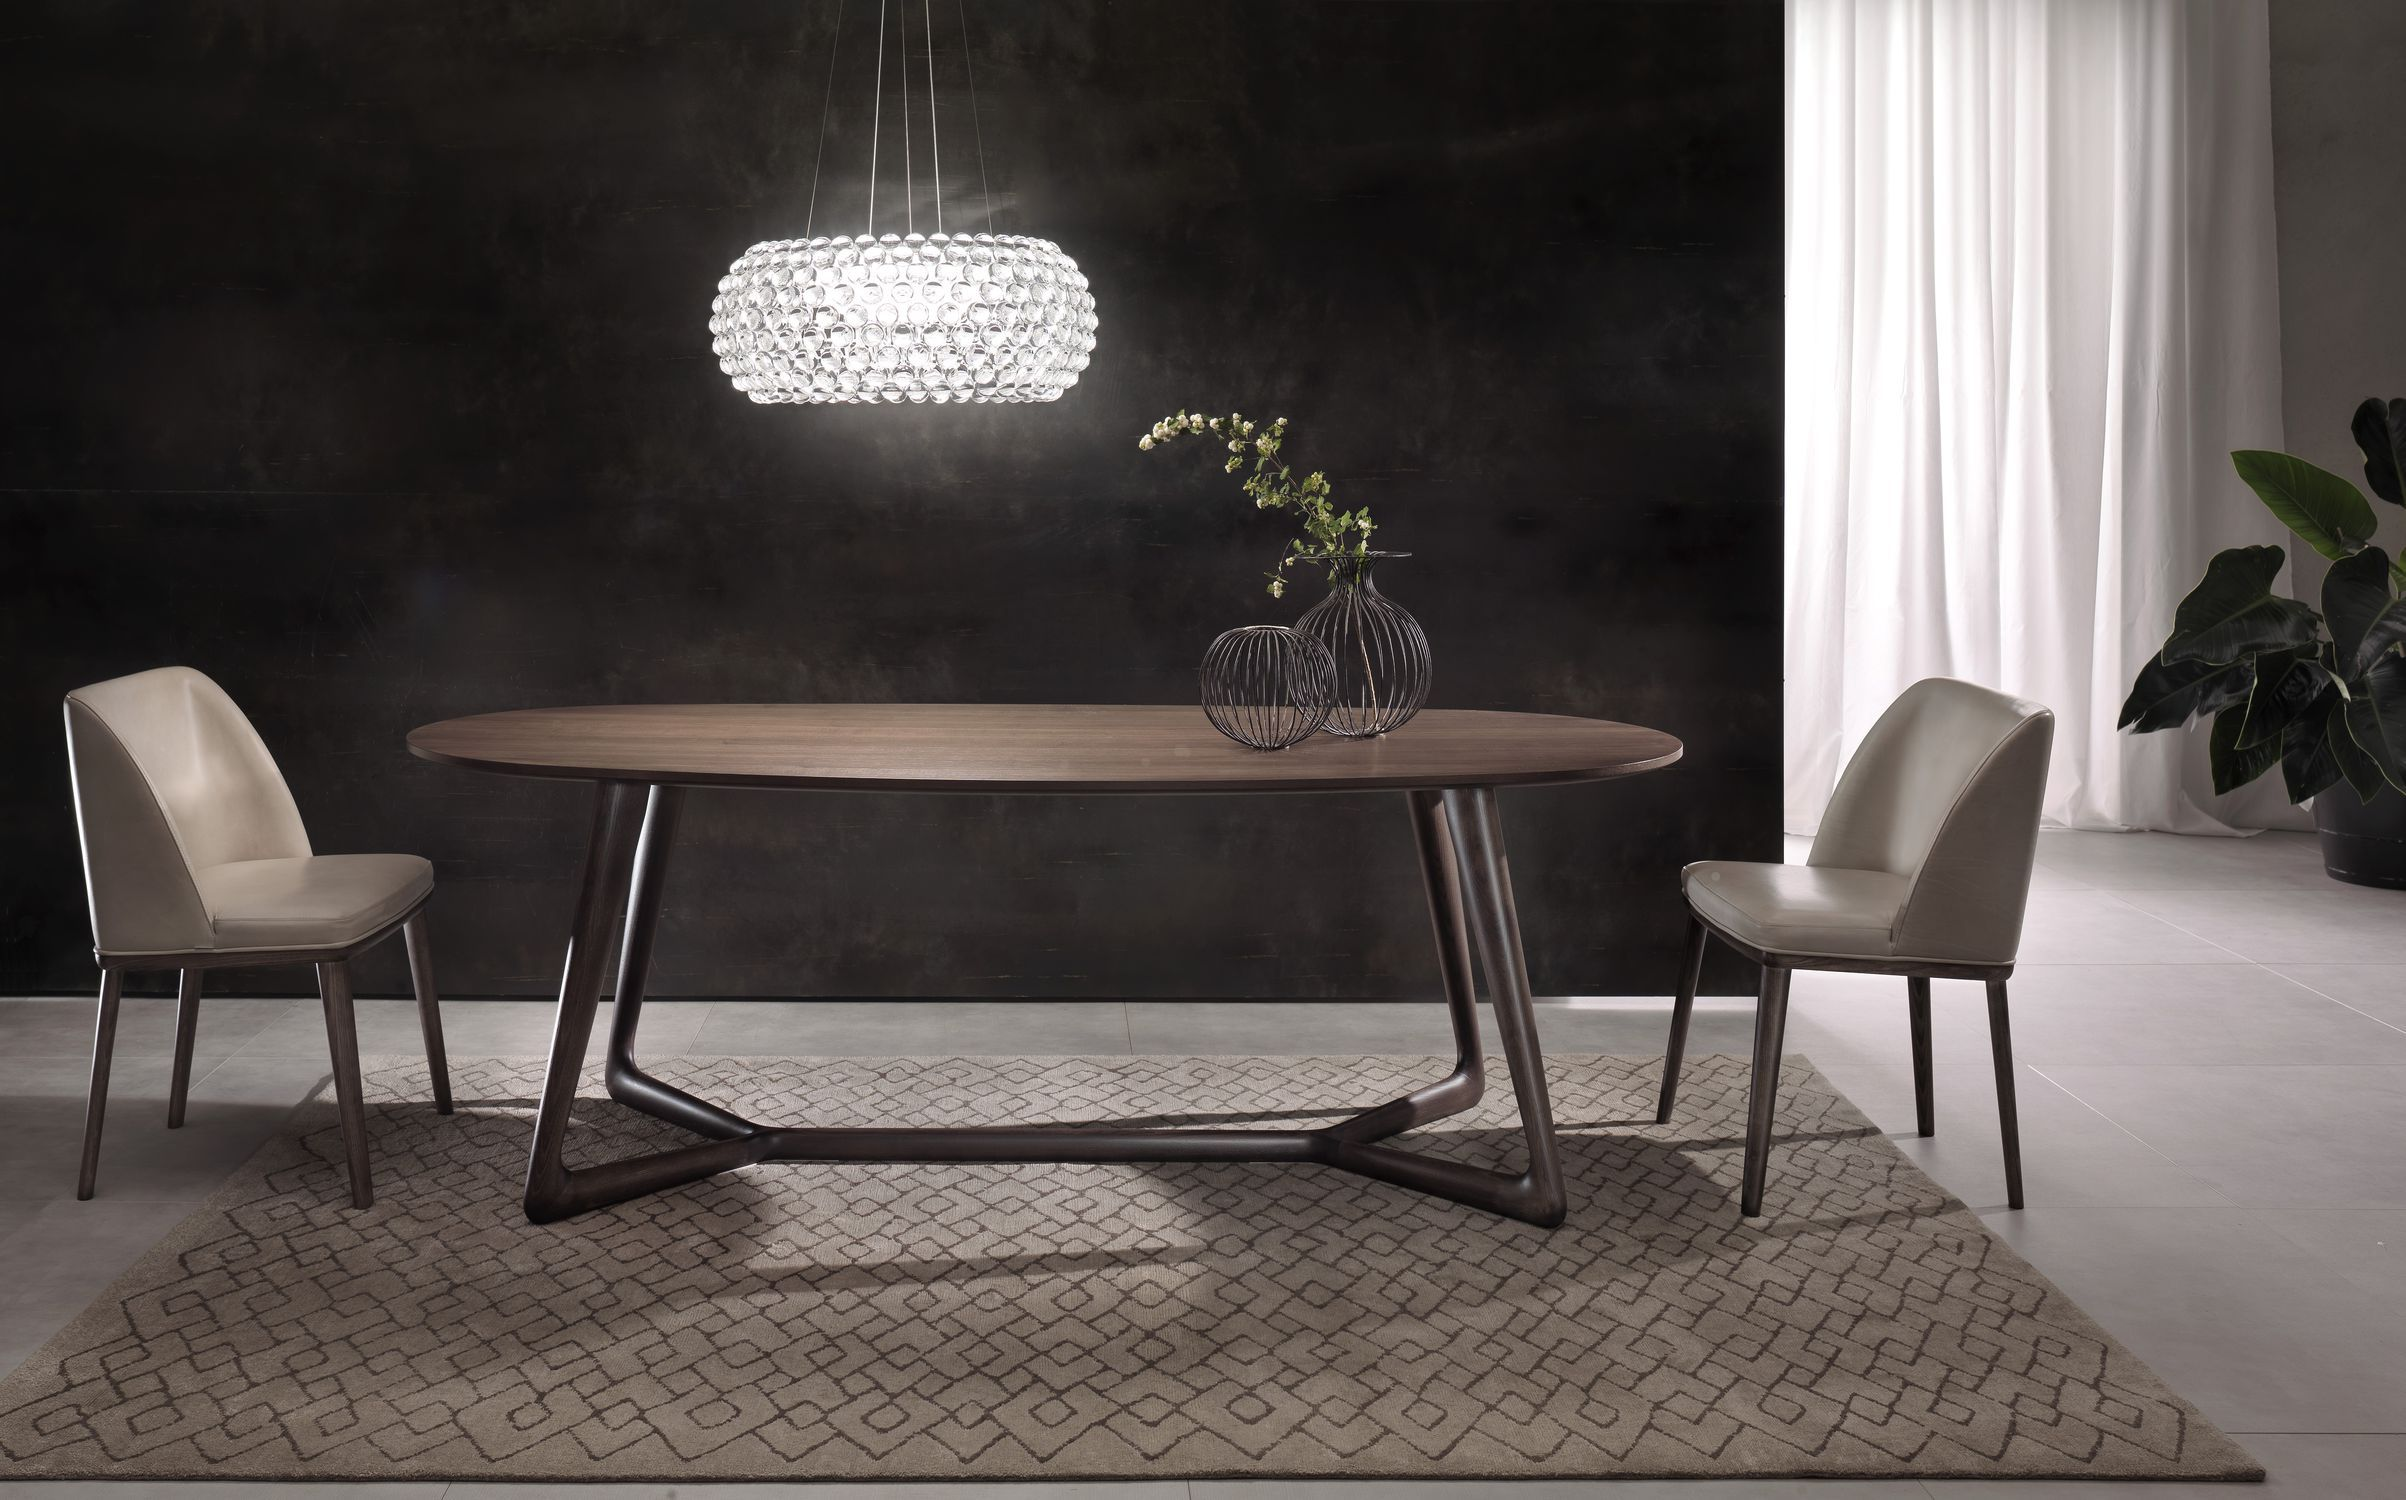 Tavolo ovale legno moderno | Eziadilabio